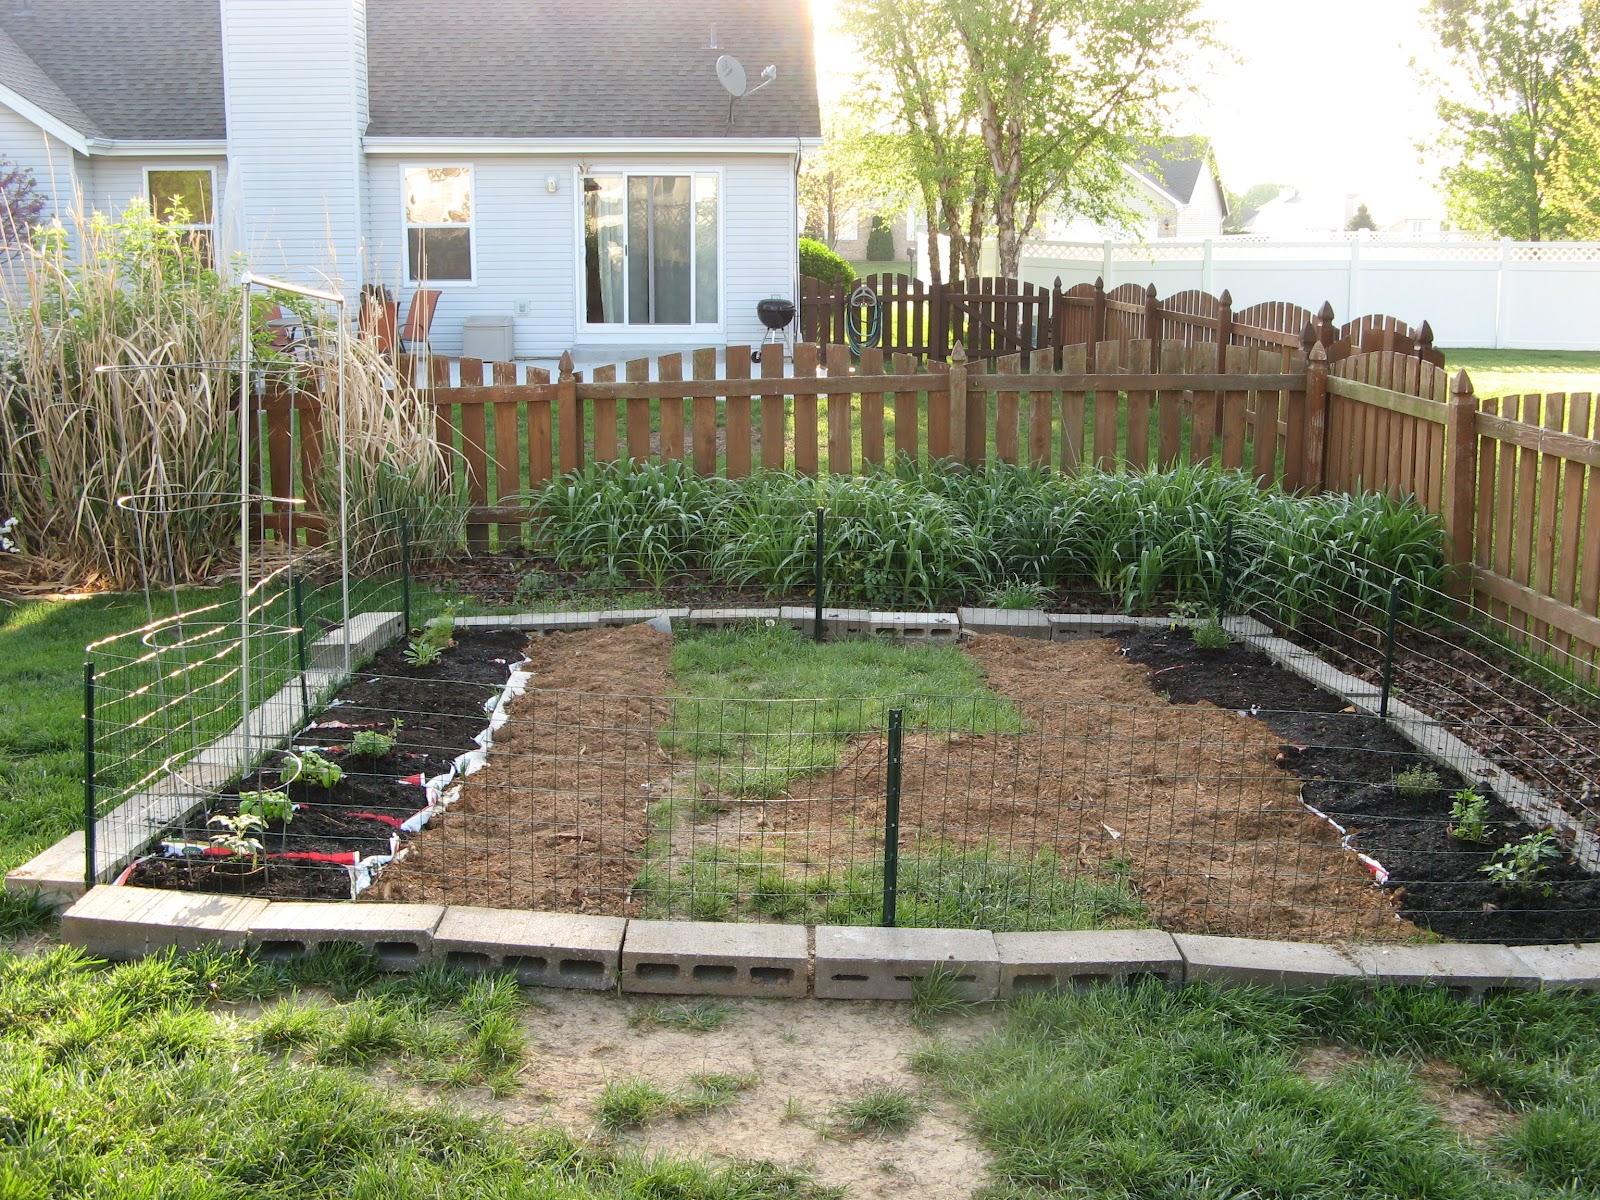 french hollow farm the backyard veggie garden is underway